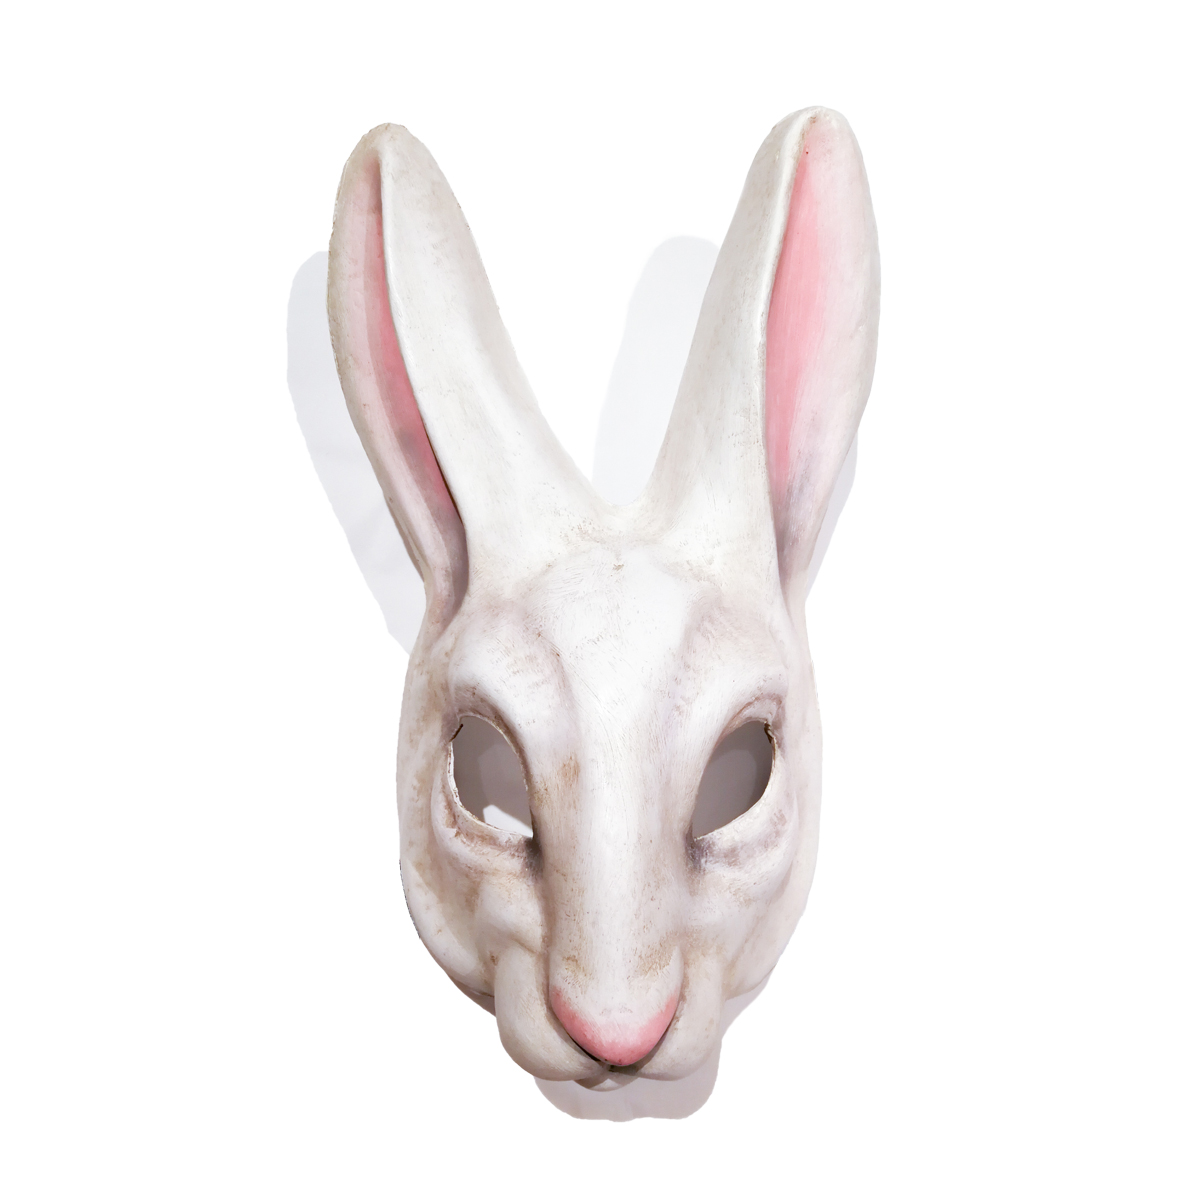 https://i2.wp.com/www.masksvenice.com/wp-content/uploads/2018/08/cartapesta-coniglio-bianco.jpg?fit=1200%2C1200&ssl=1